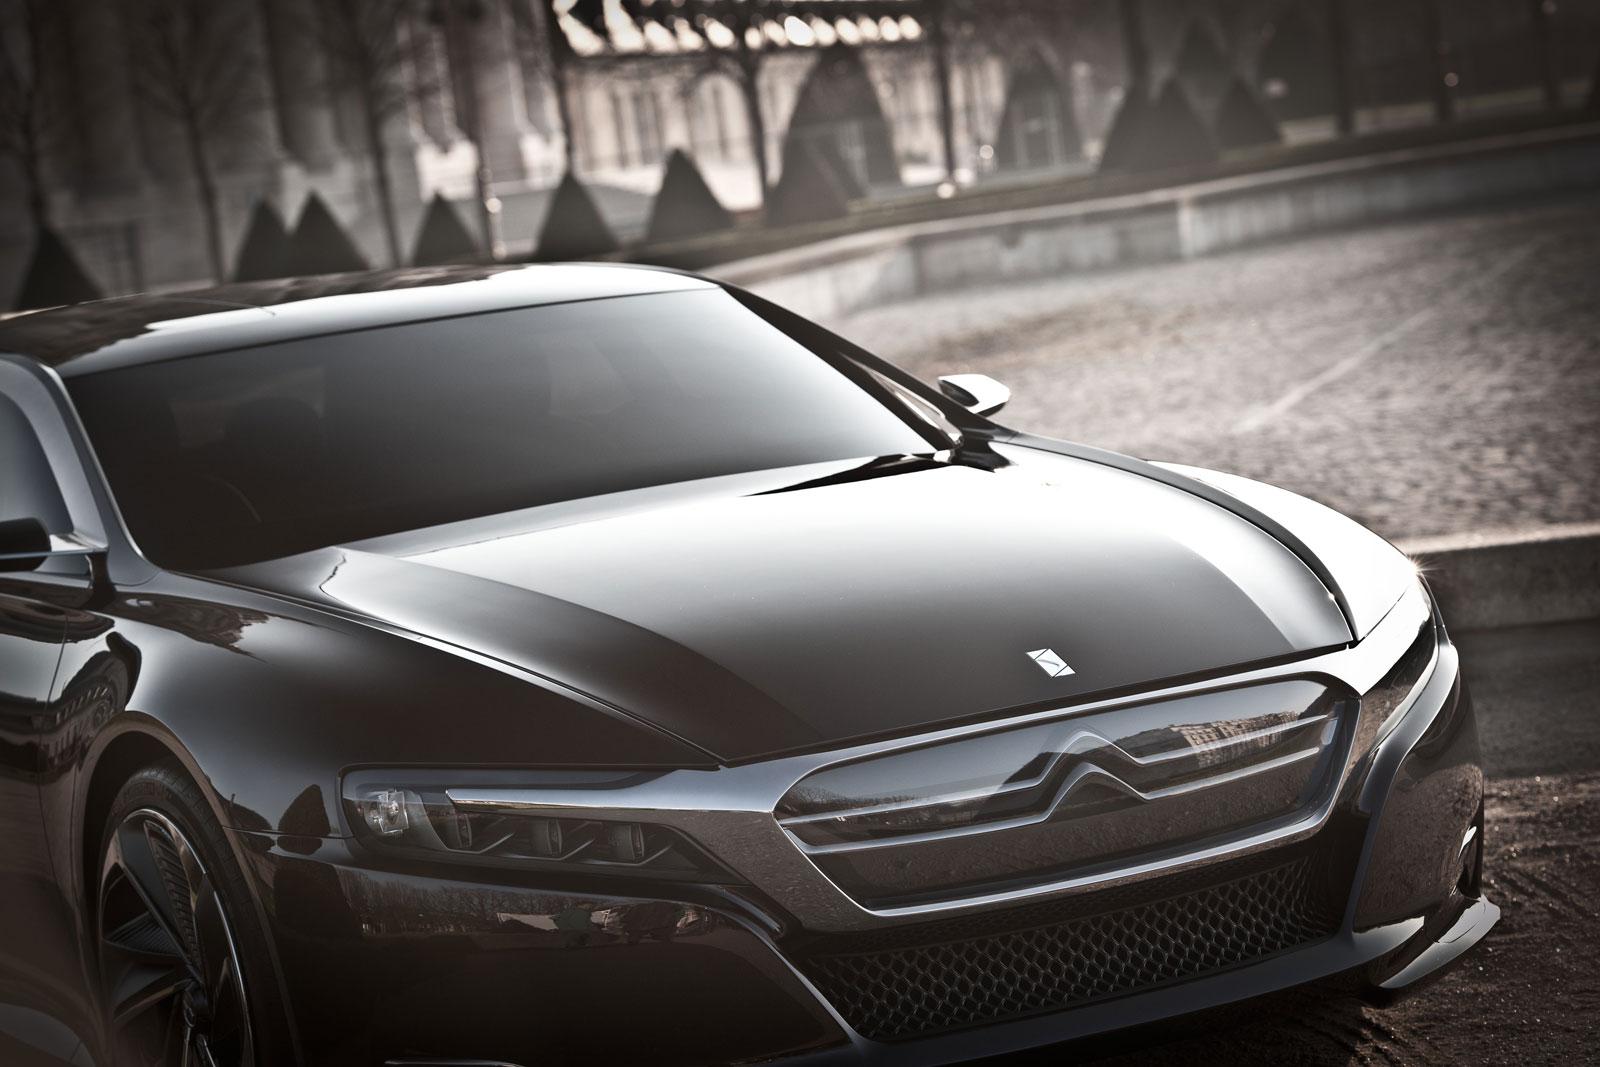 citroen numero 9 concept car body design. Black Bedroom Furniture Sets. Home Design Ideas